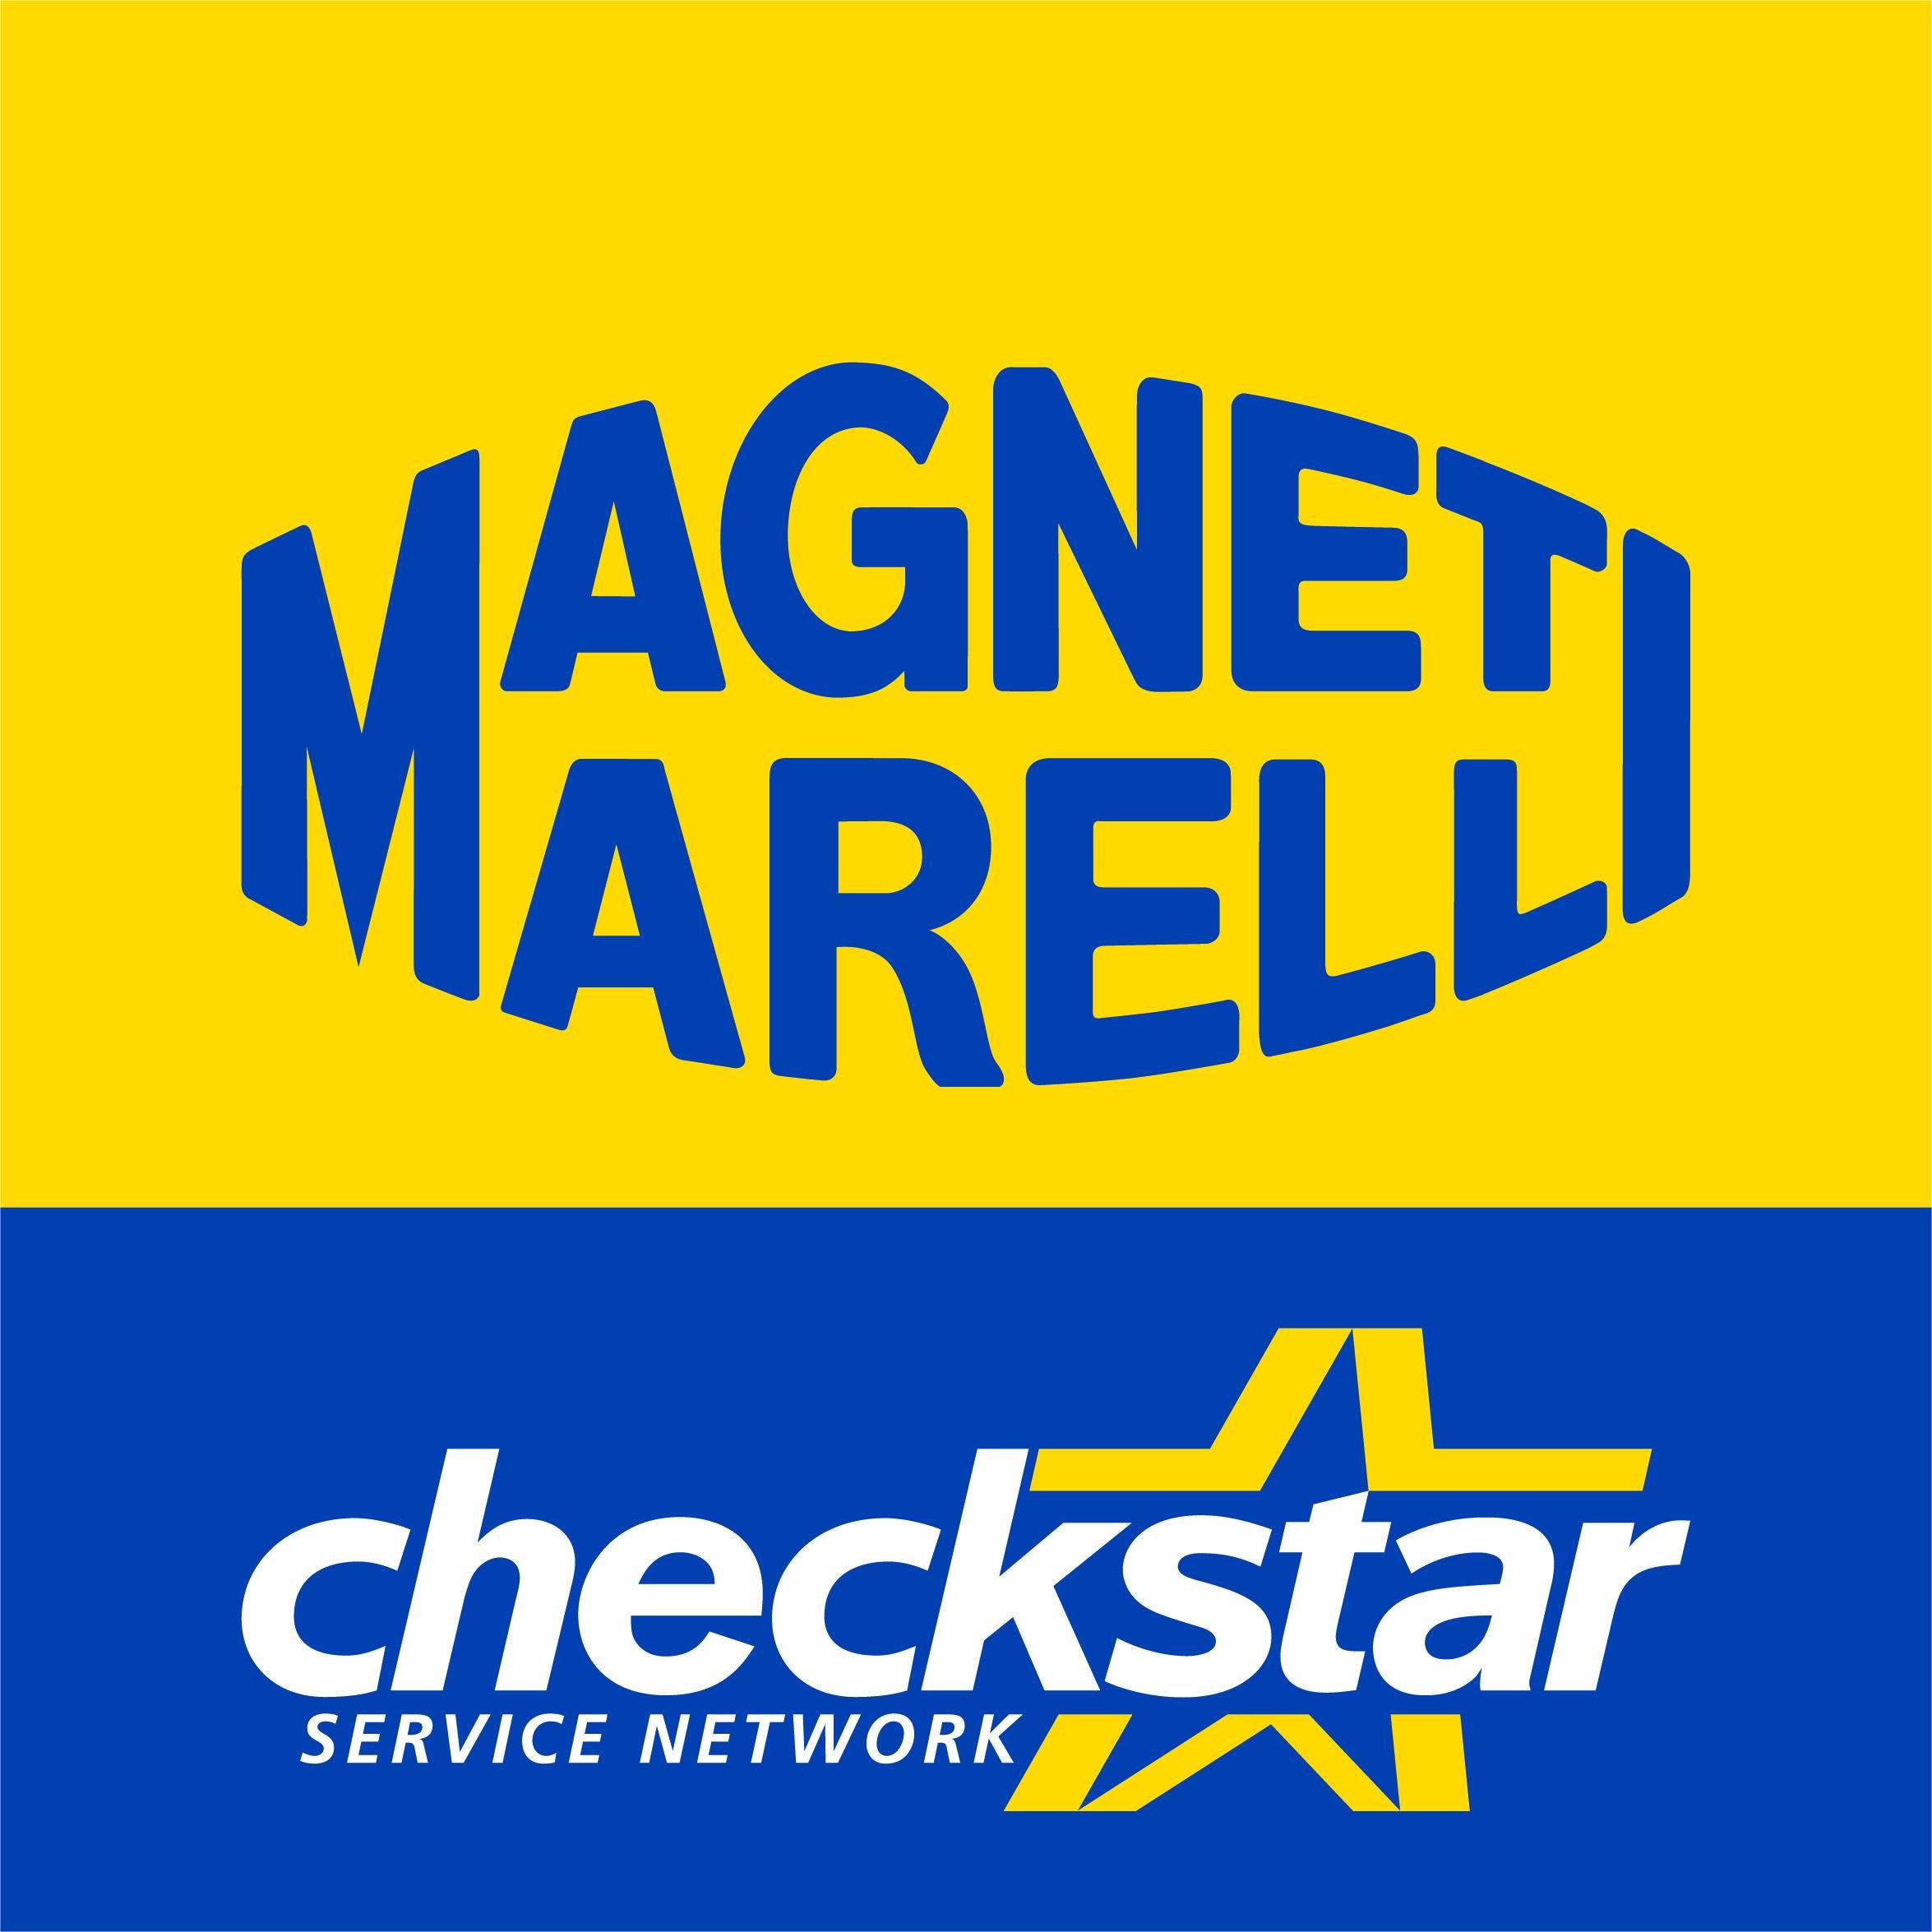 Brdr. Dan Biler A/S - Magneti Marelli Checkstar logo